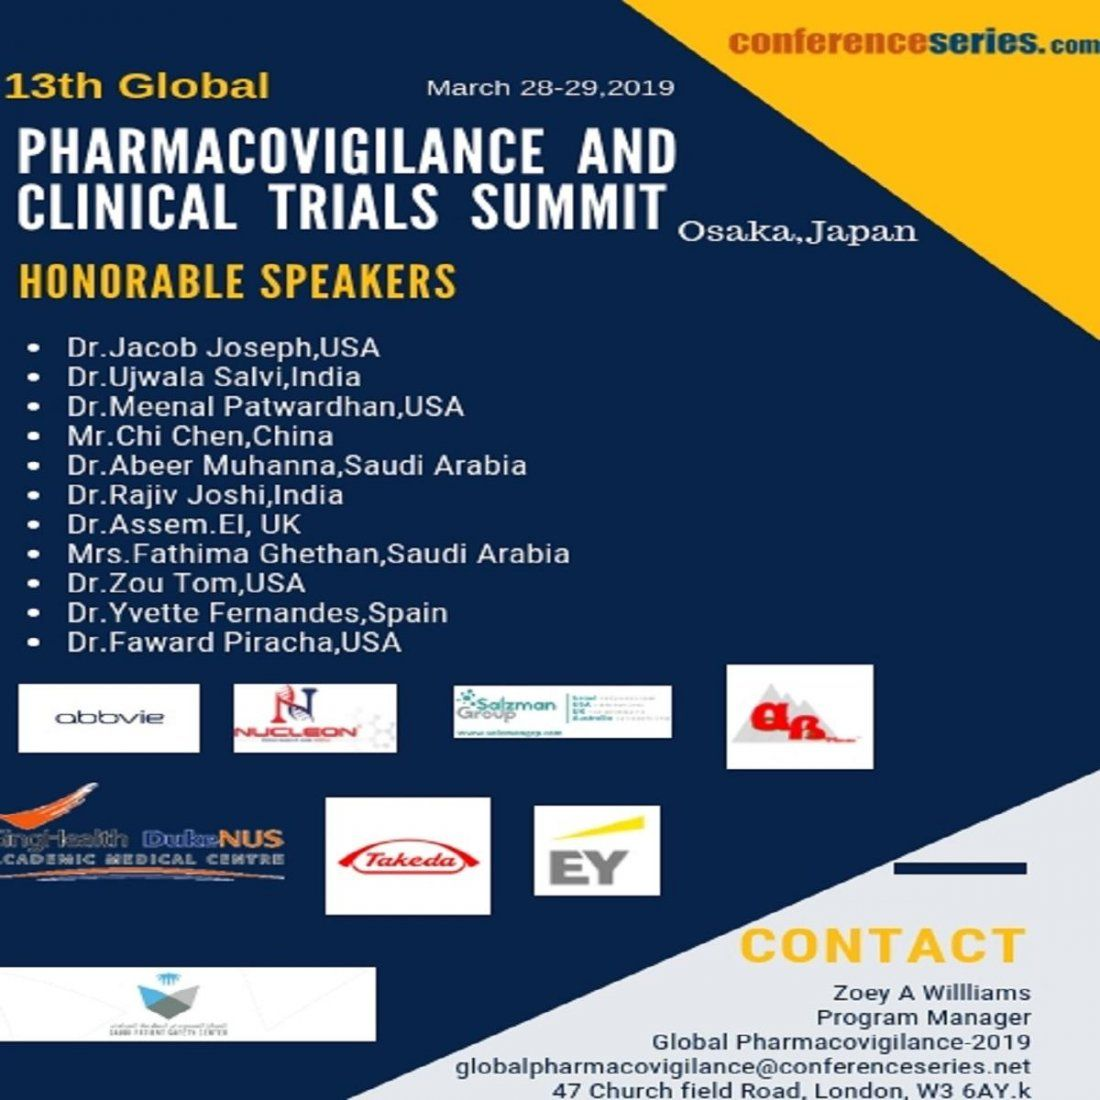 13th Global Pharmacovigilance & Clinical Trials